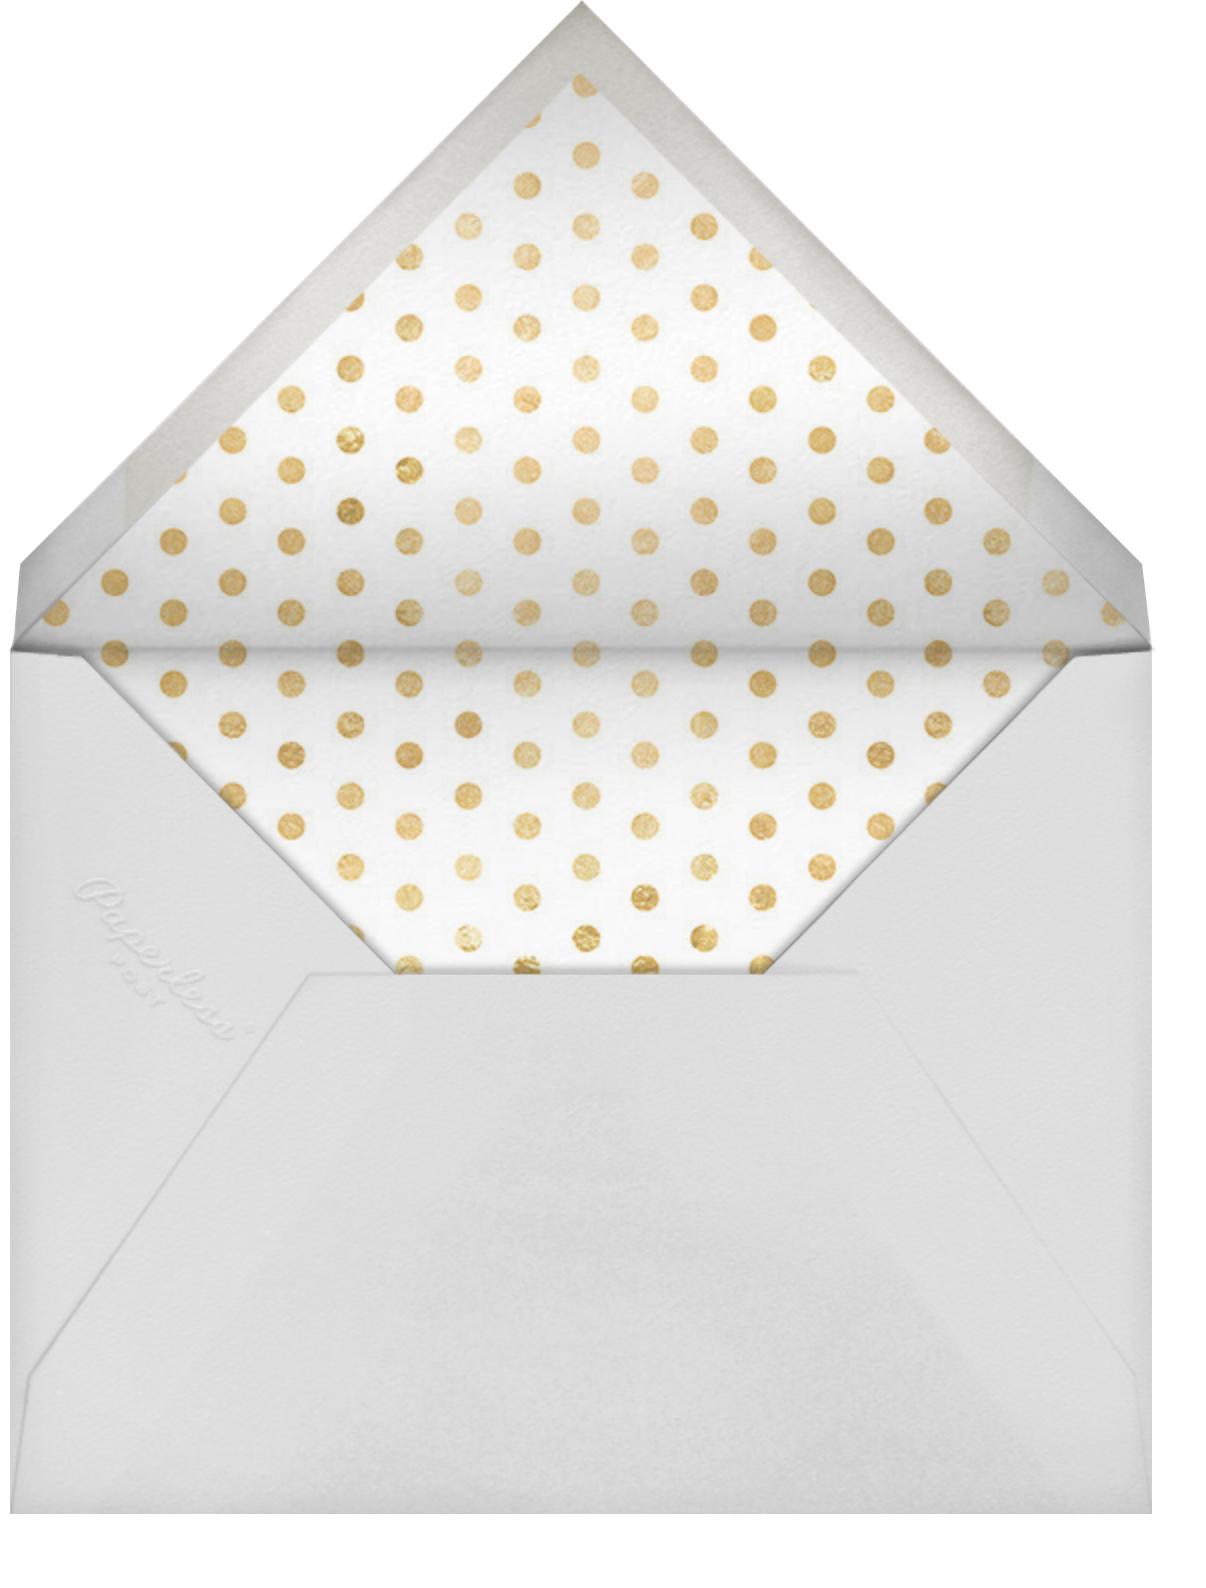 Buttercup Garland - Rifle Paper Co. - Graduation party - envelope back